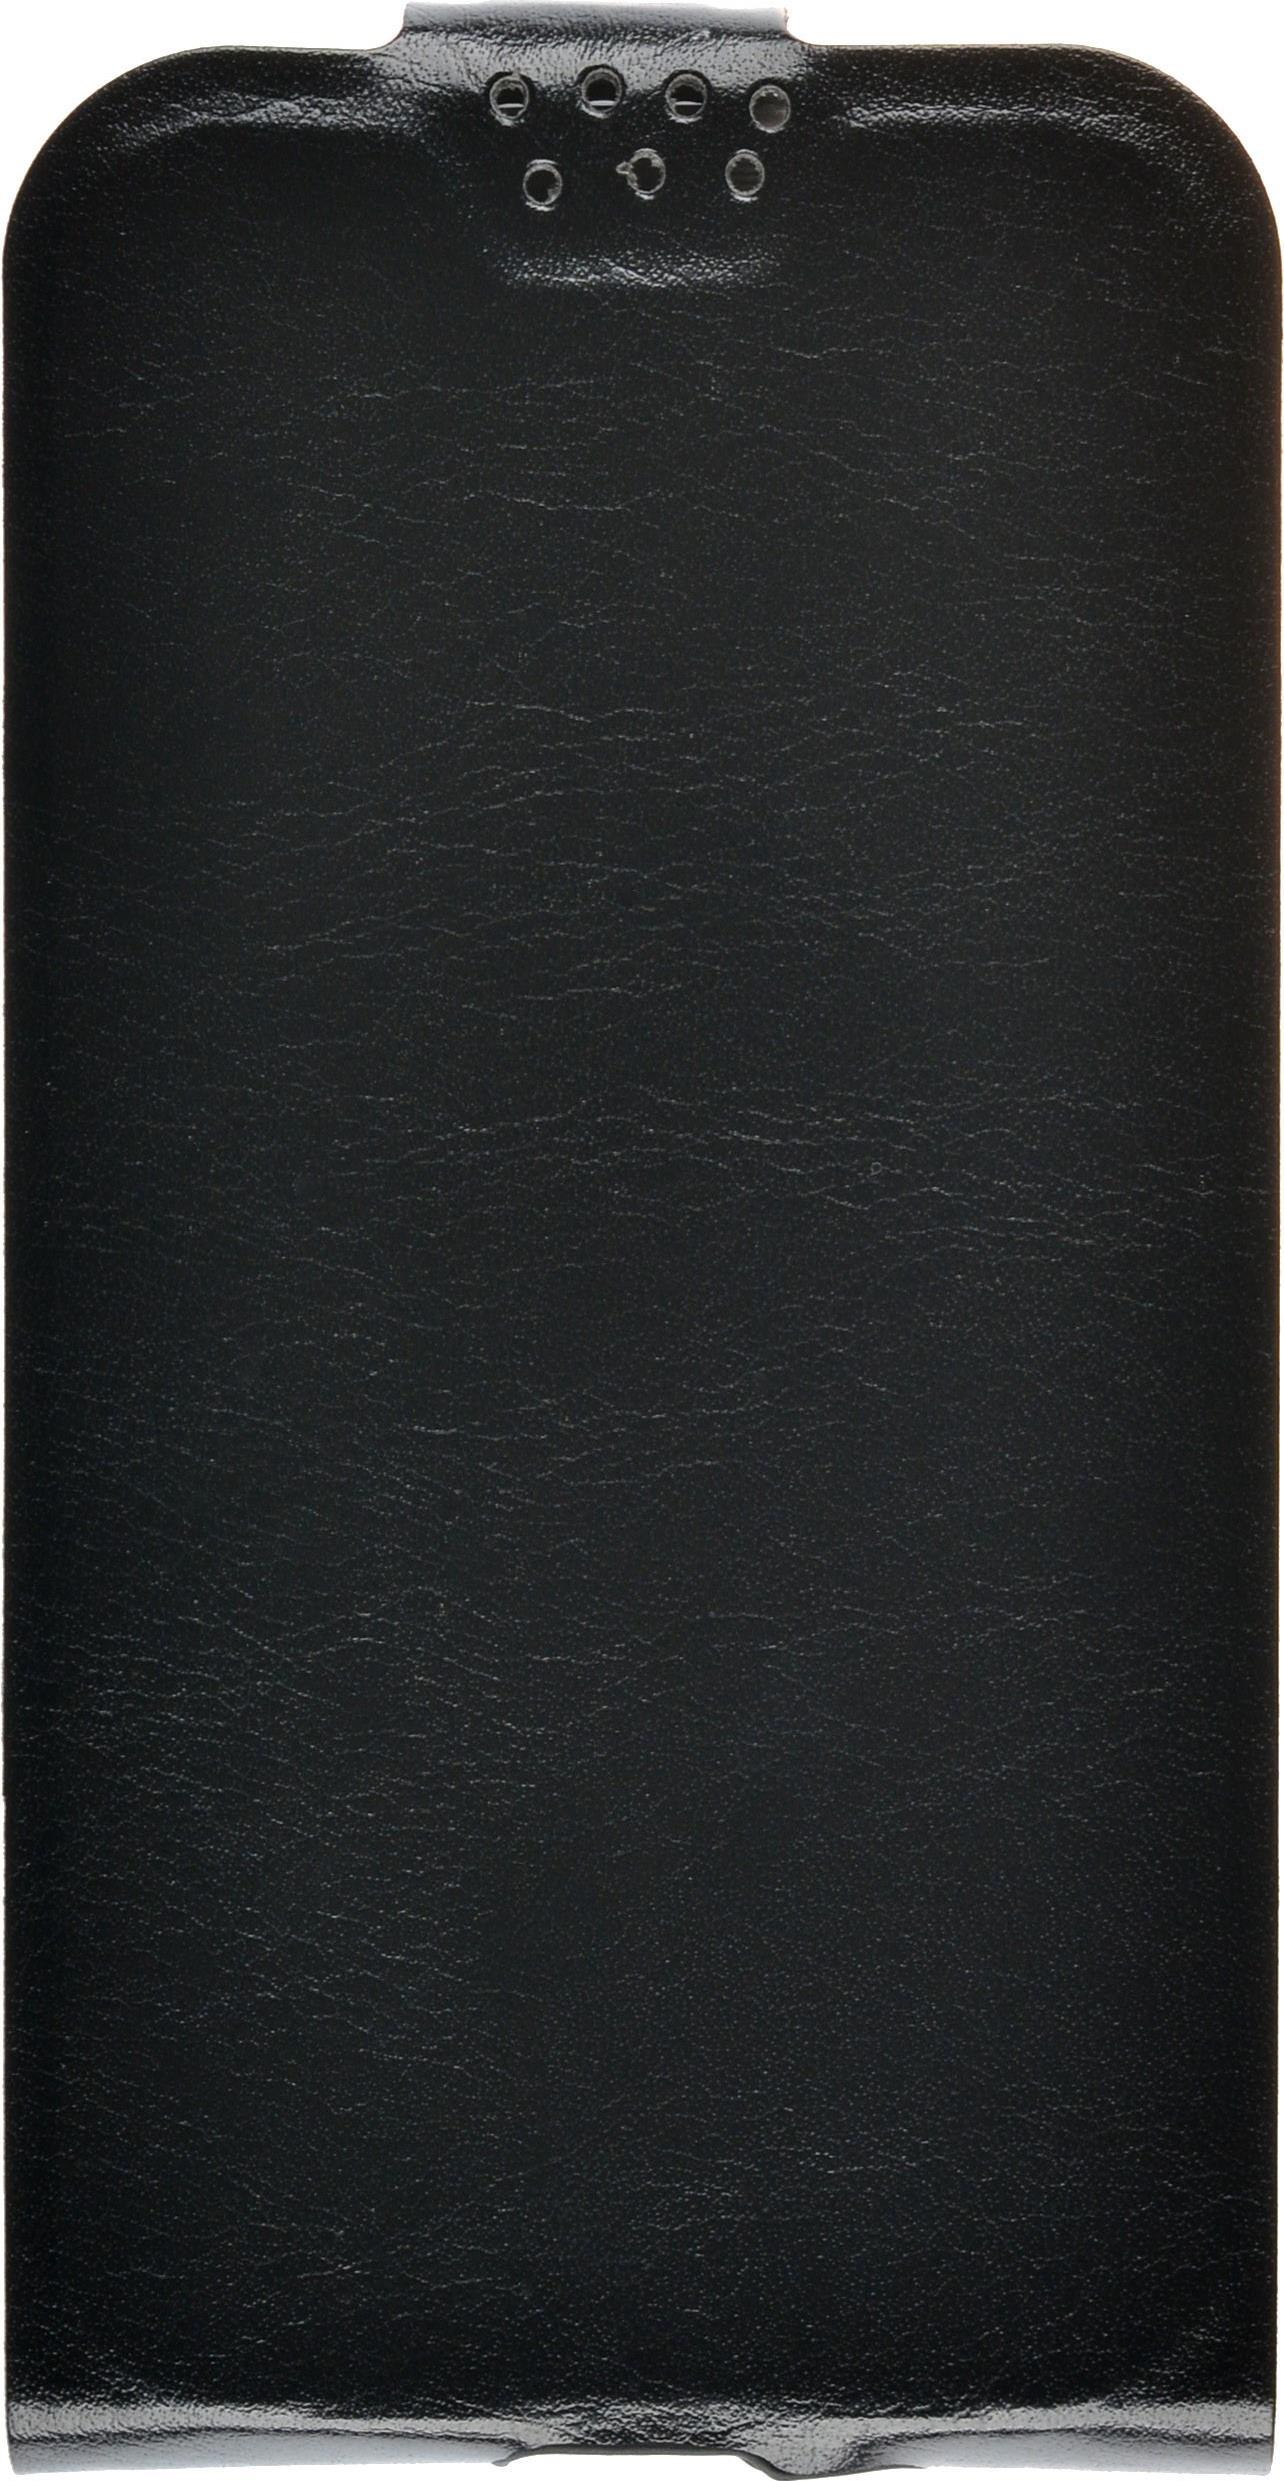 Чехол для сотового телефона skinBOX Flip slim, 4660041407402, черный flip pu leather protective stand case cover for zte blade l2